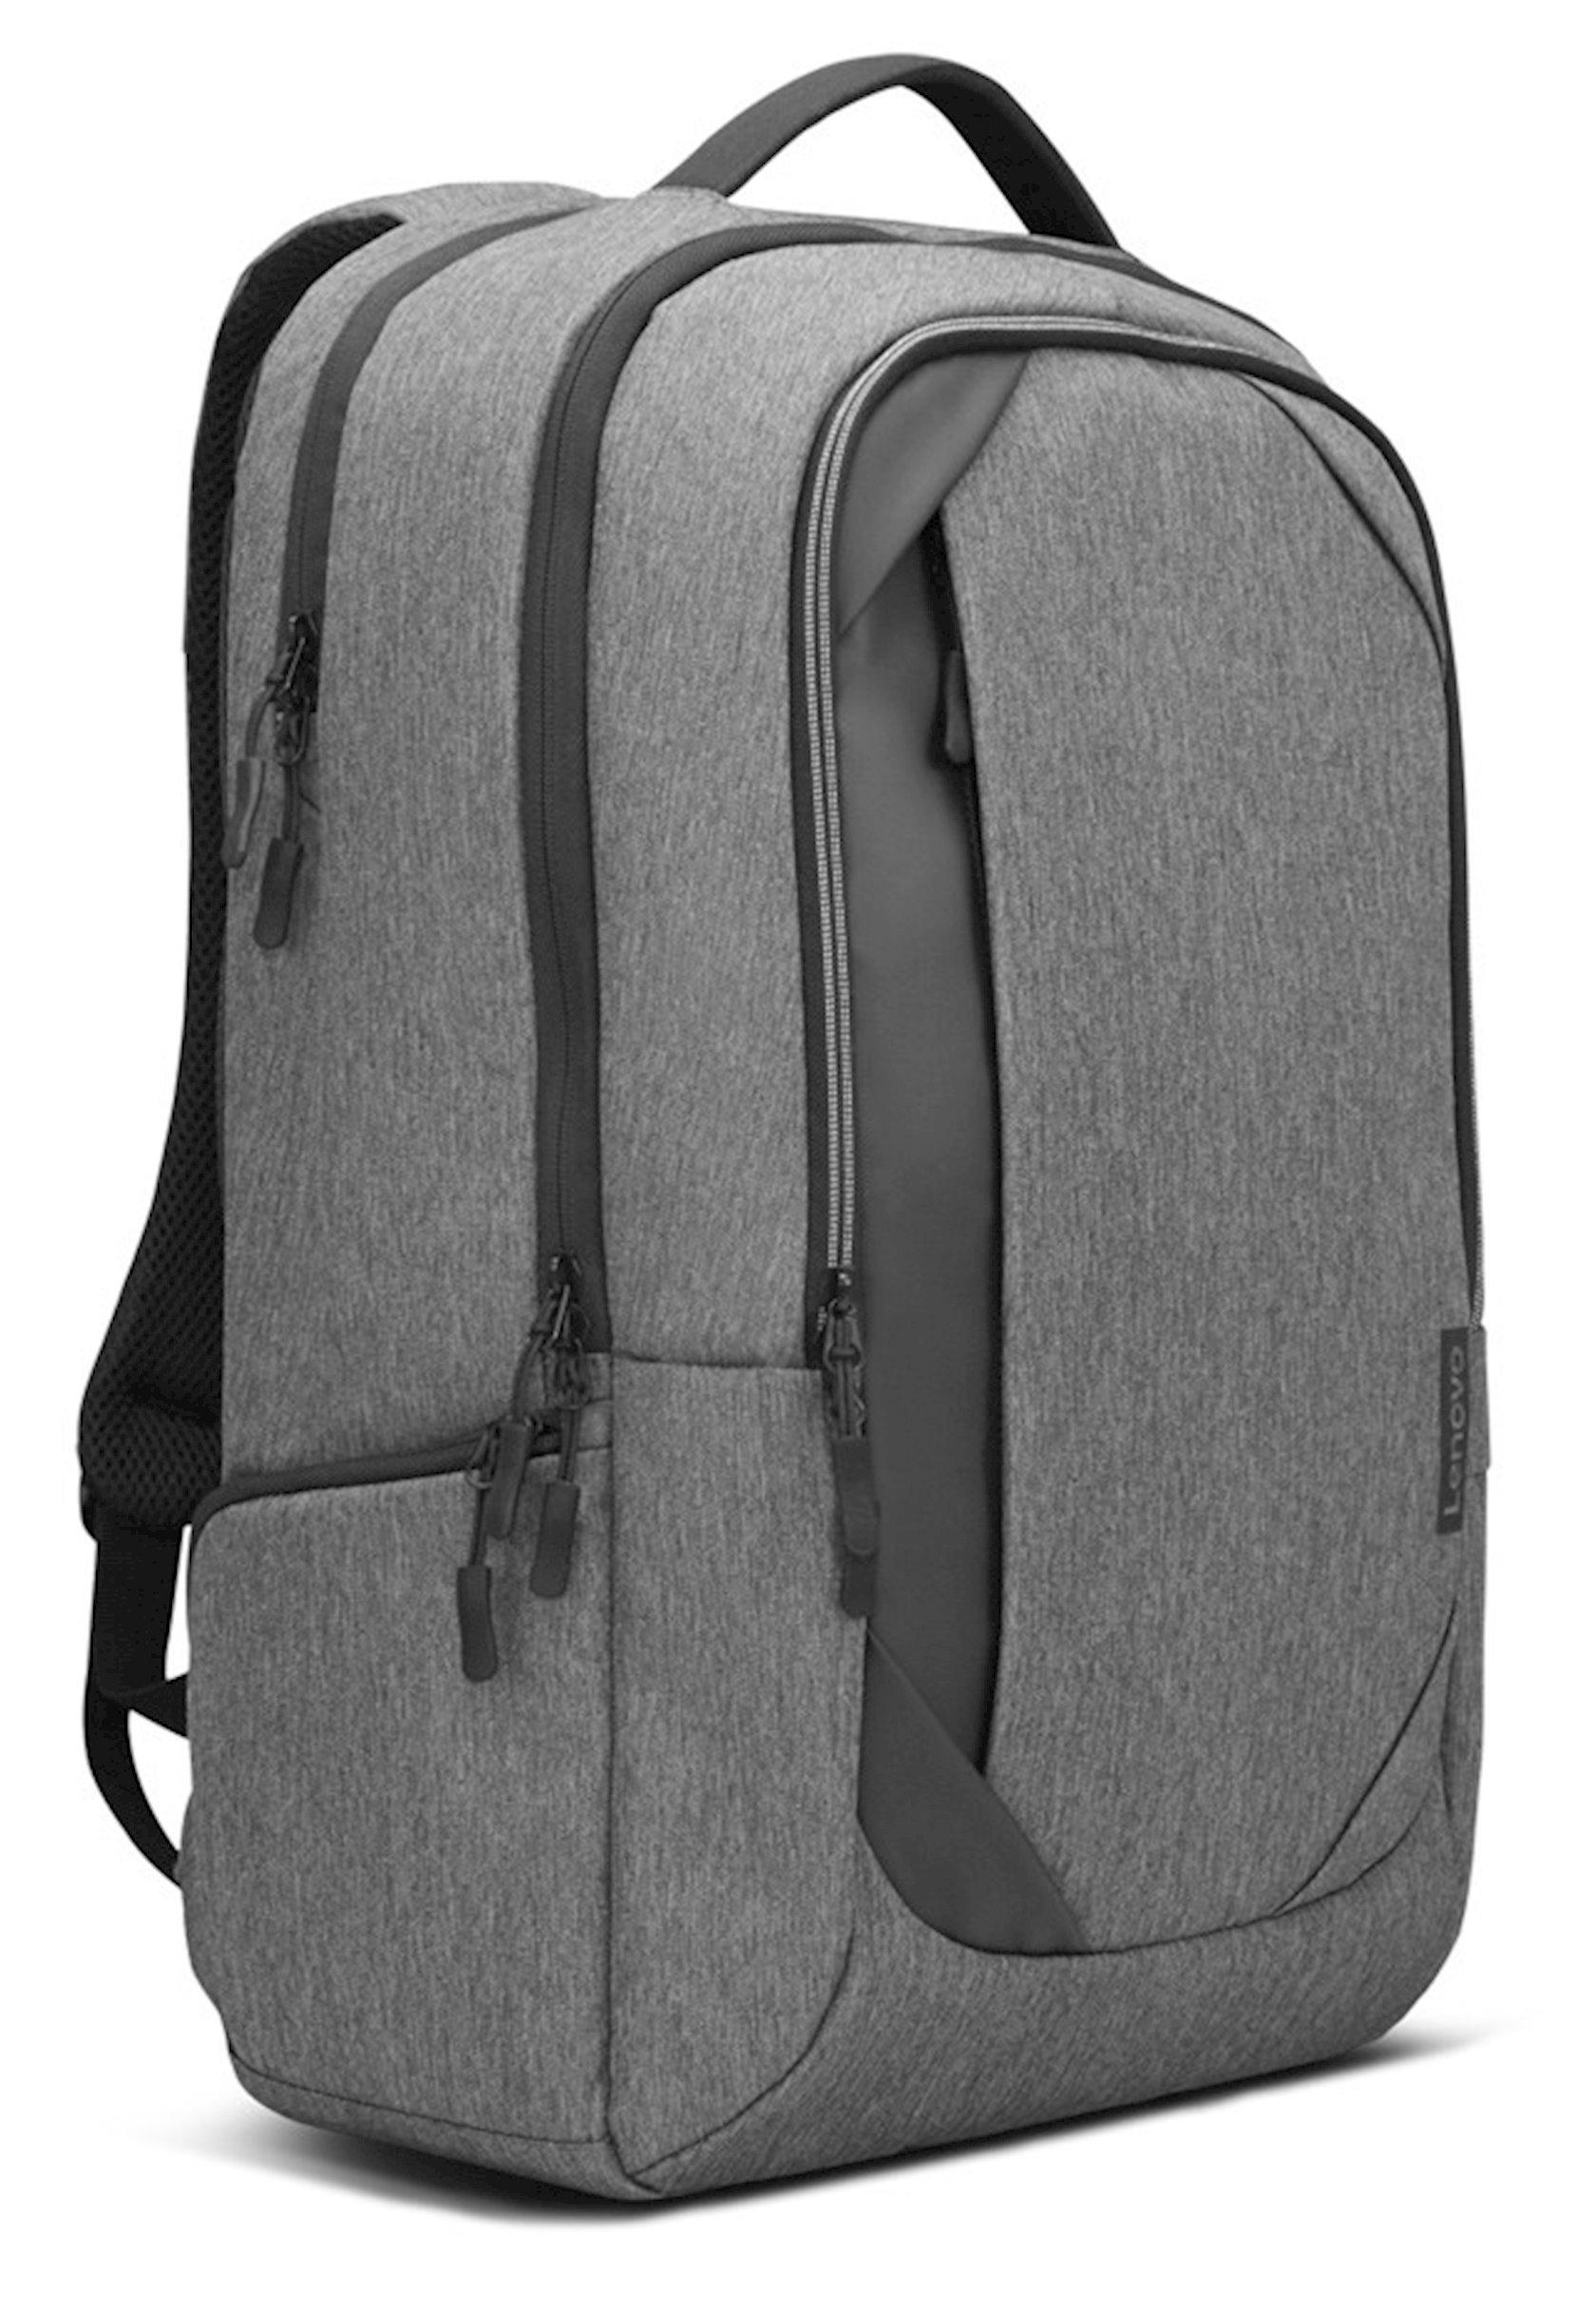 "Noutbuk üçün bel çantası 17"" Lenovo Business Casual Backpack (4X40X54260)"